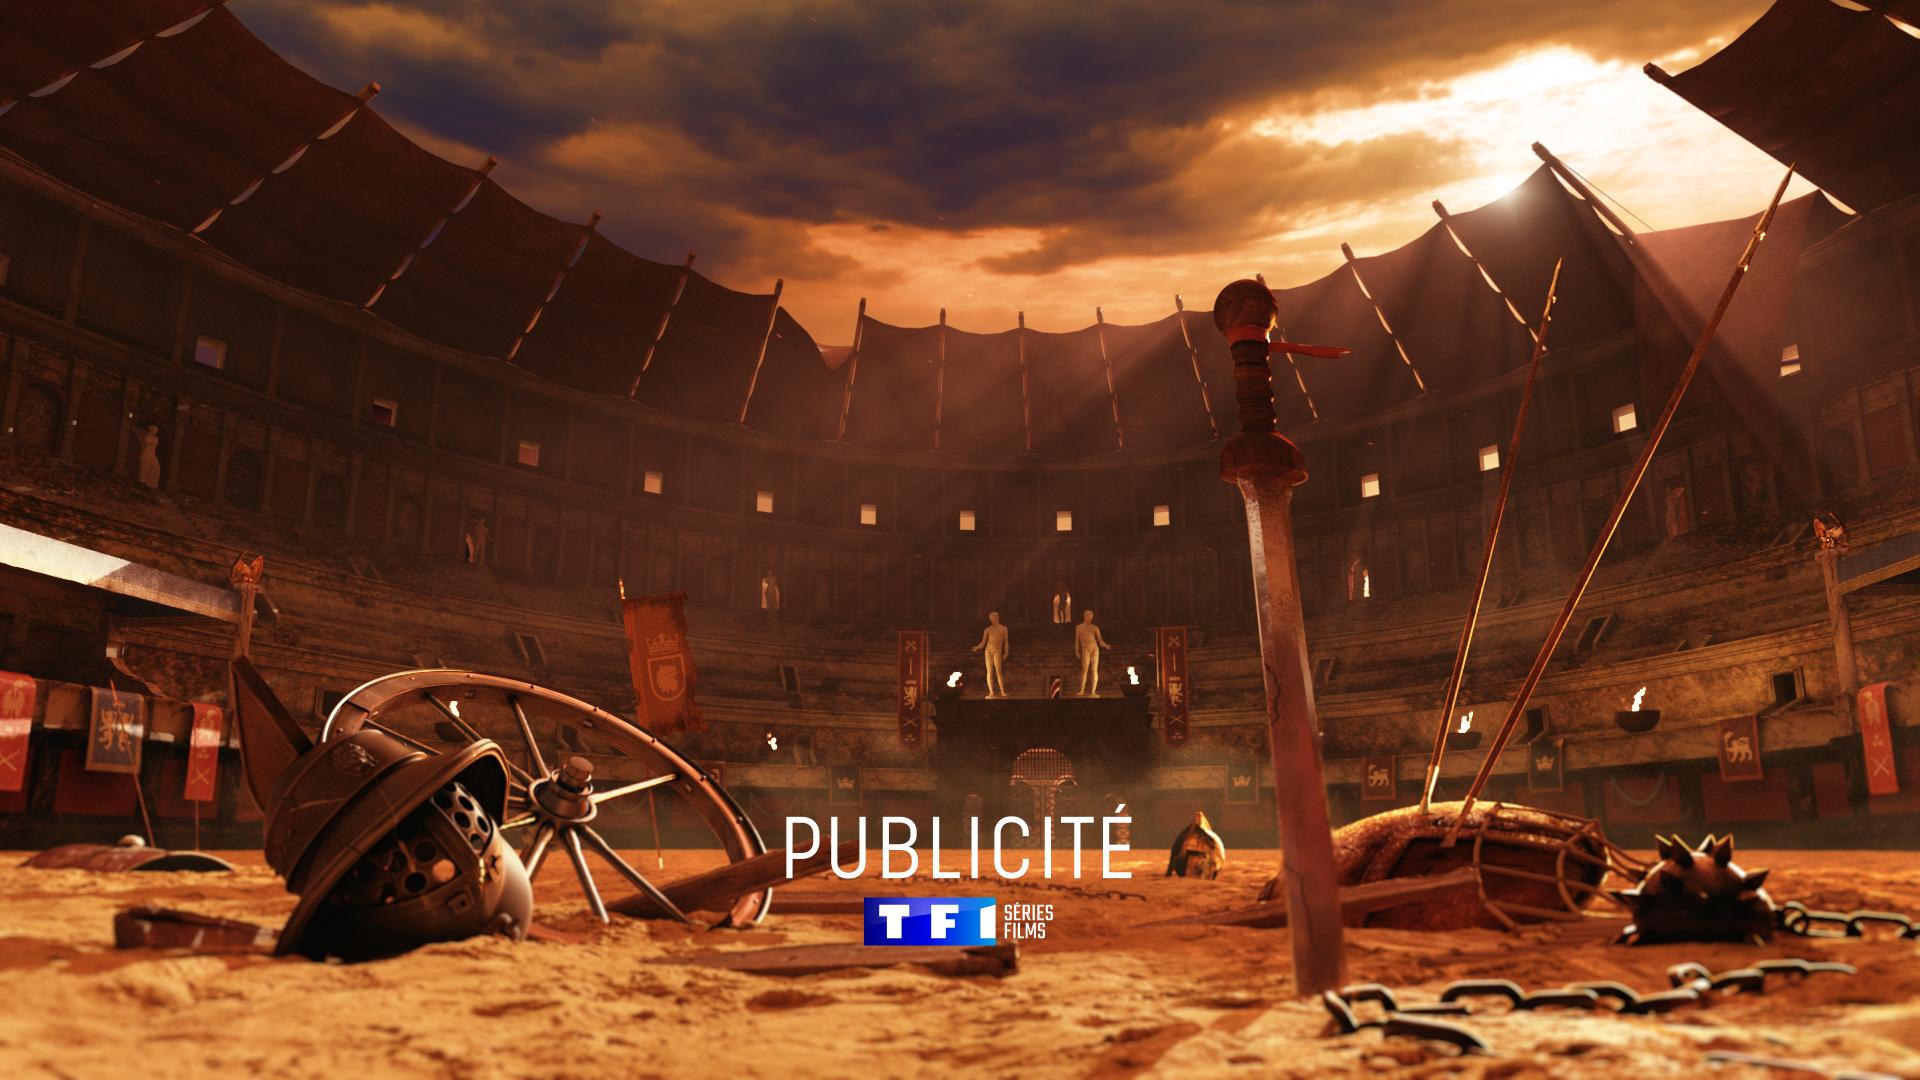 TF1_SF_JINGLES_PUB_GLADIATEURS_APRES.jpg